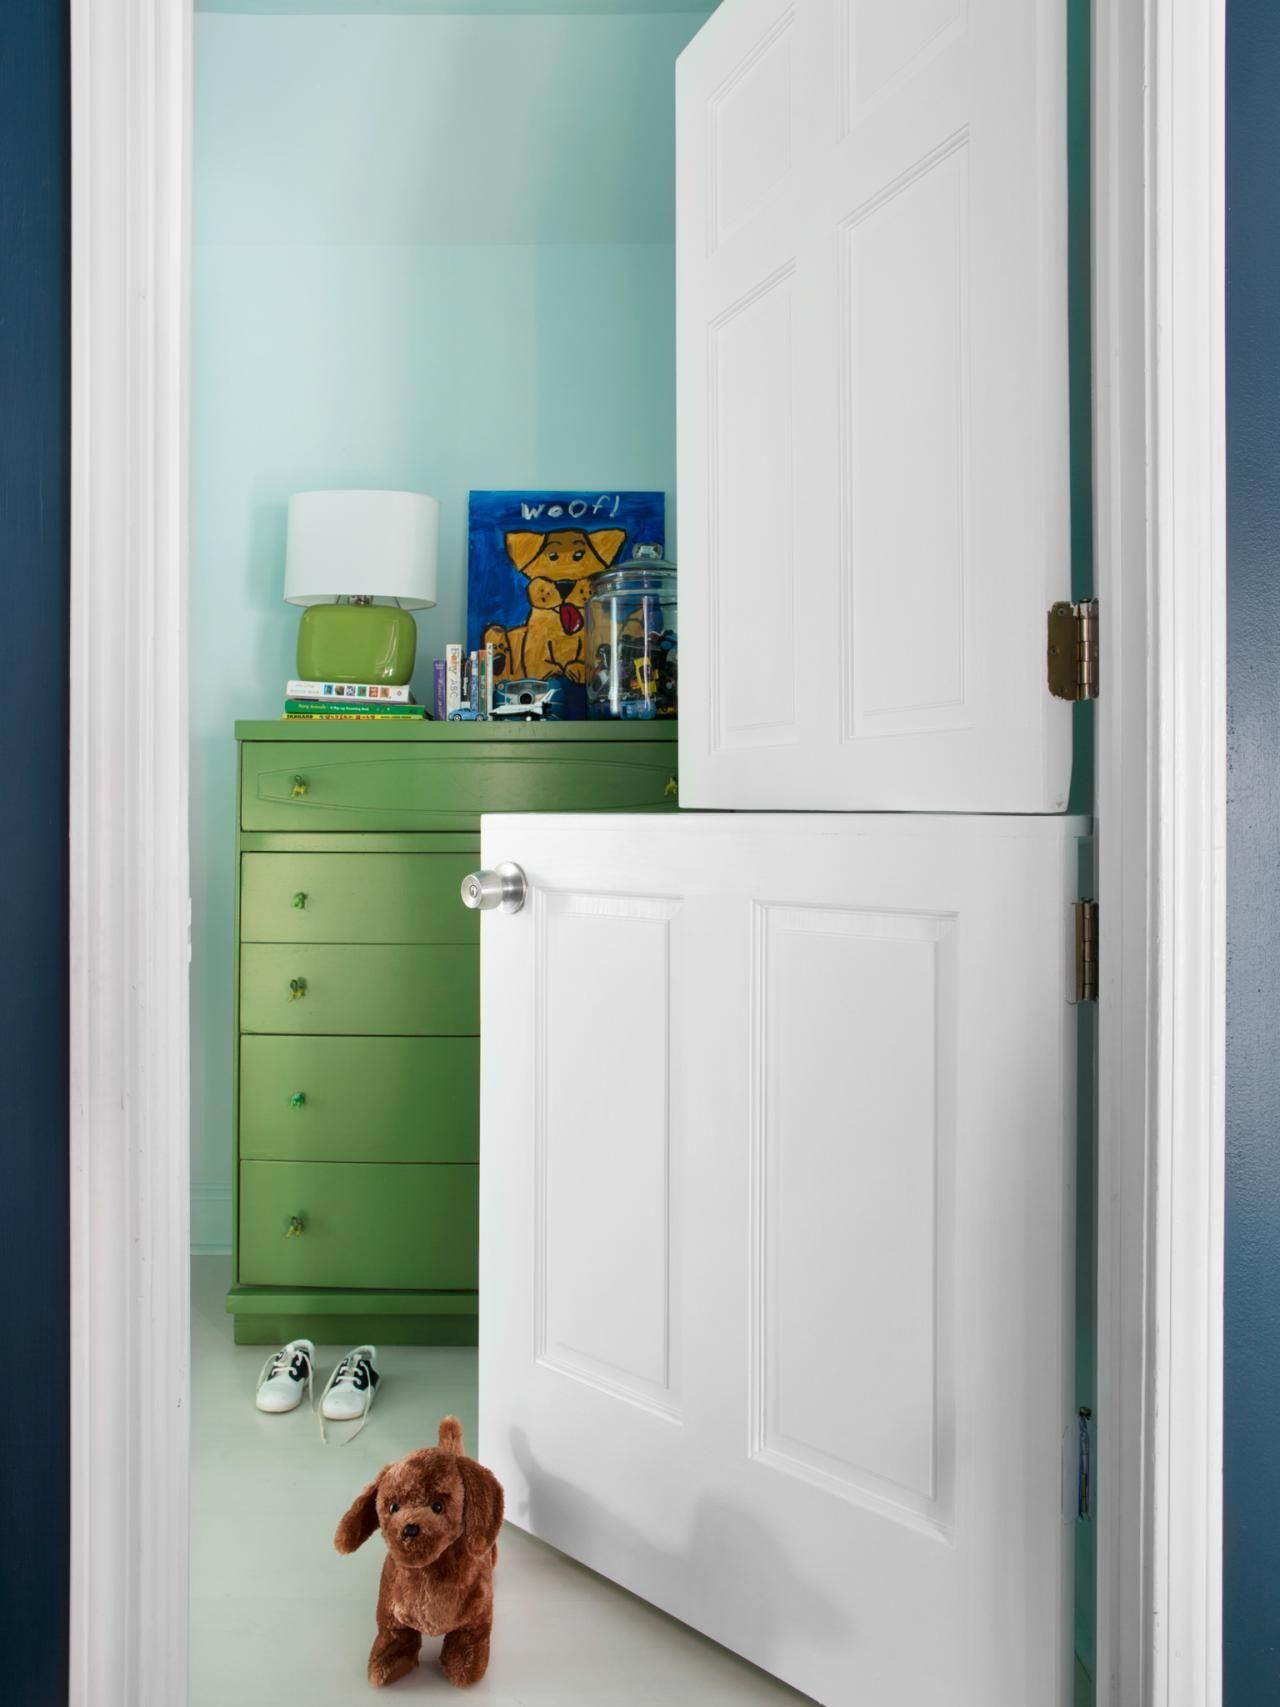 How To Make A Diy Interior Dutch Door Repurposed Pinterest